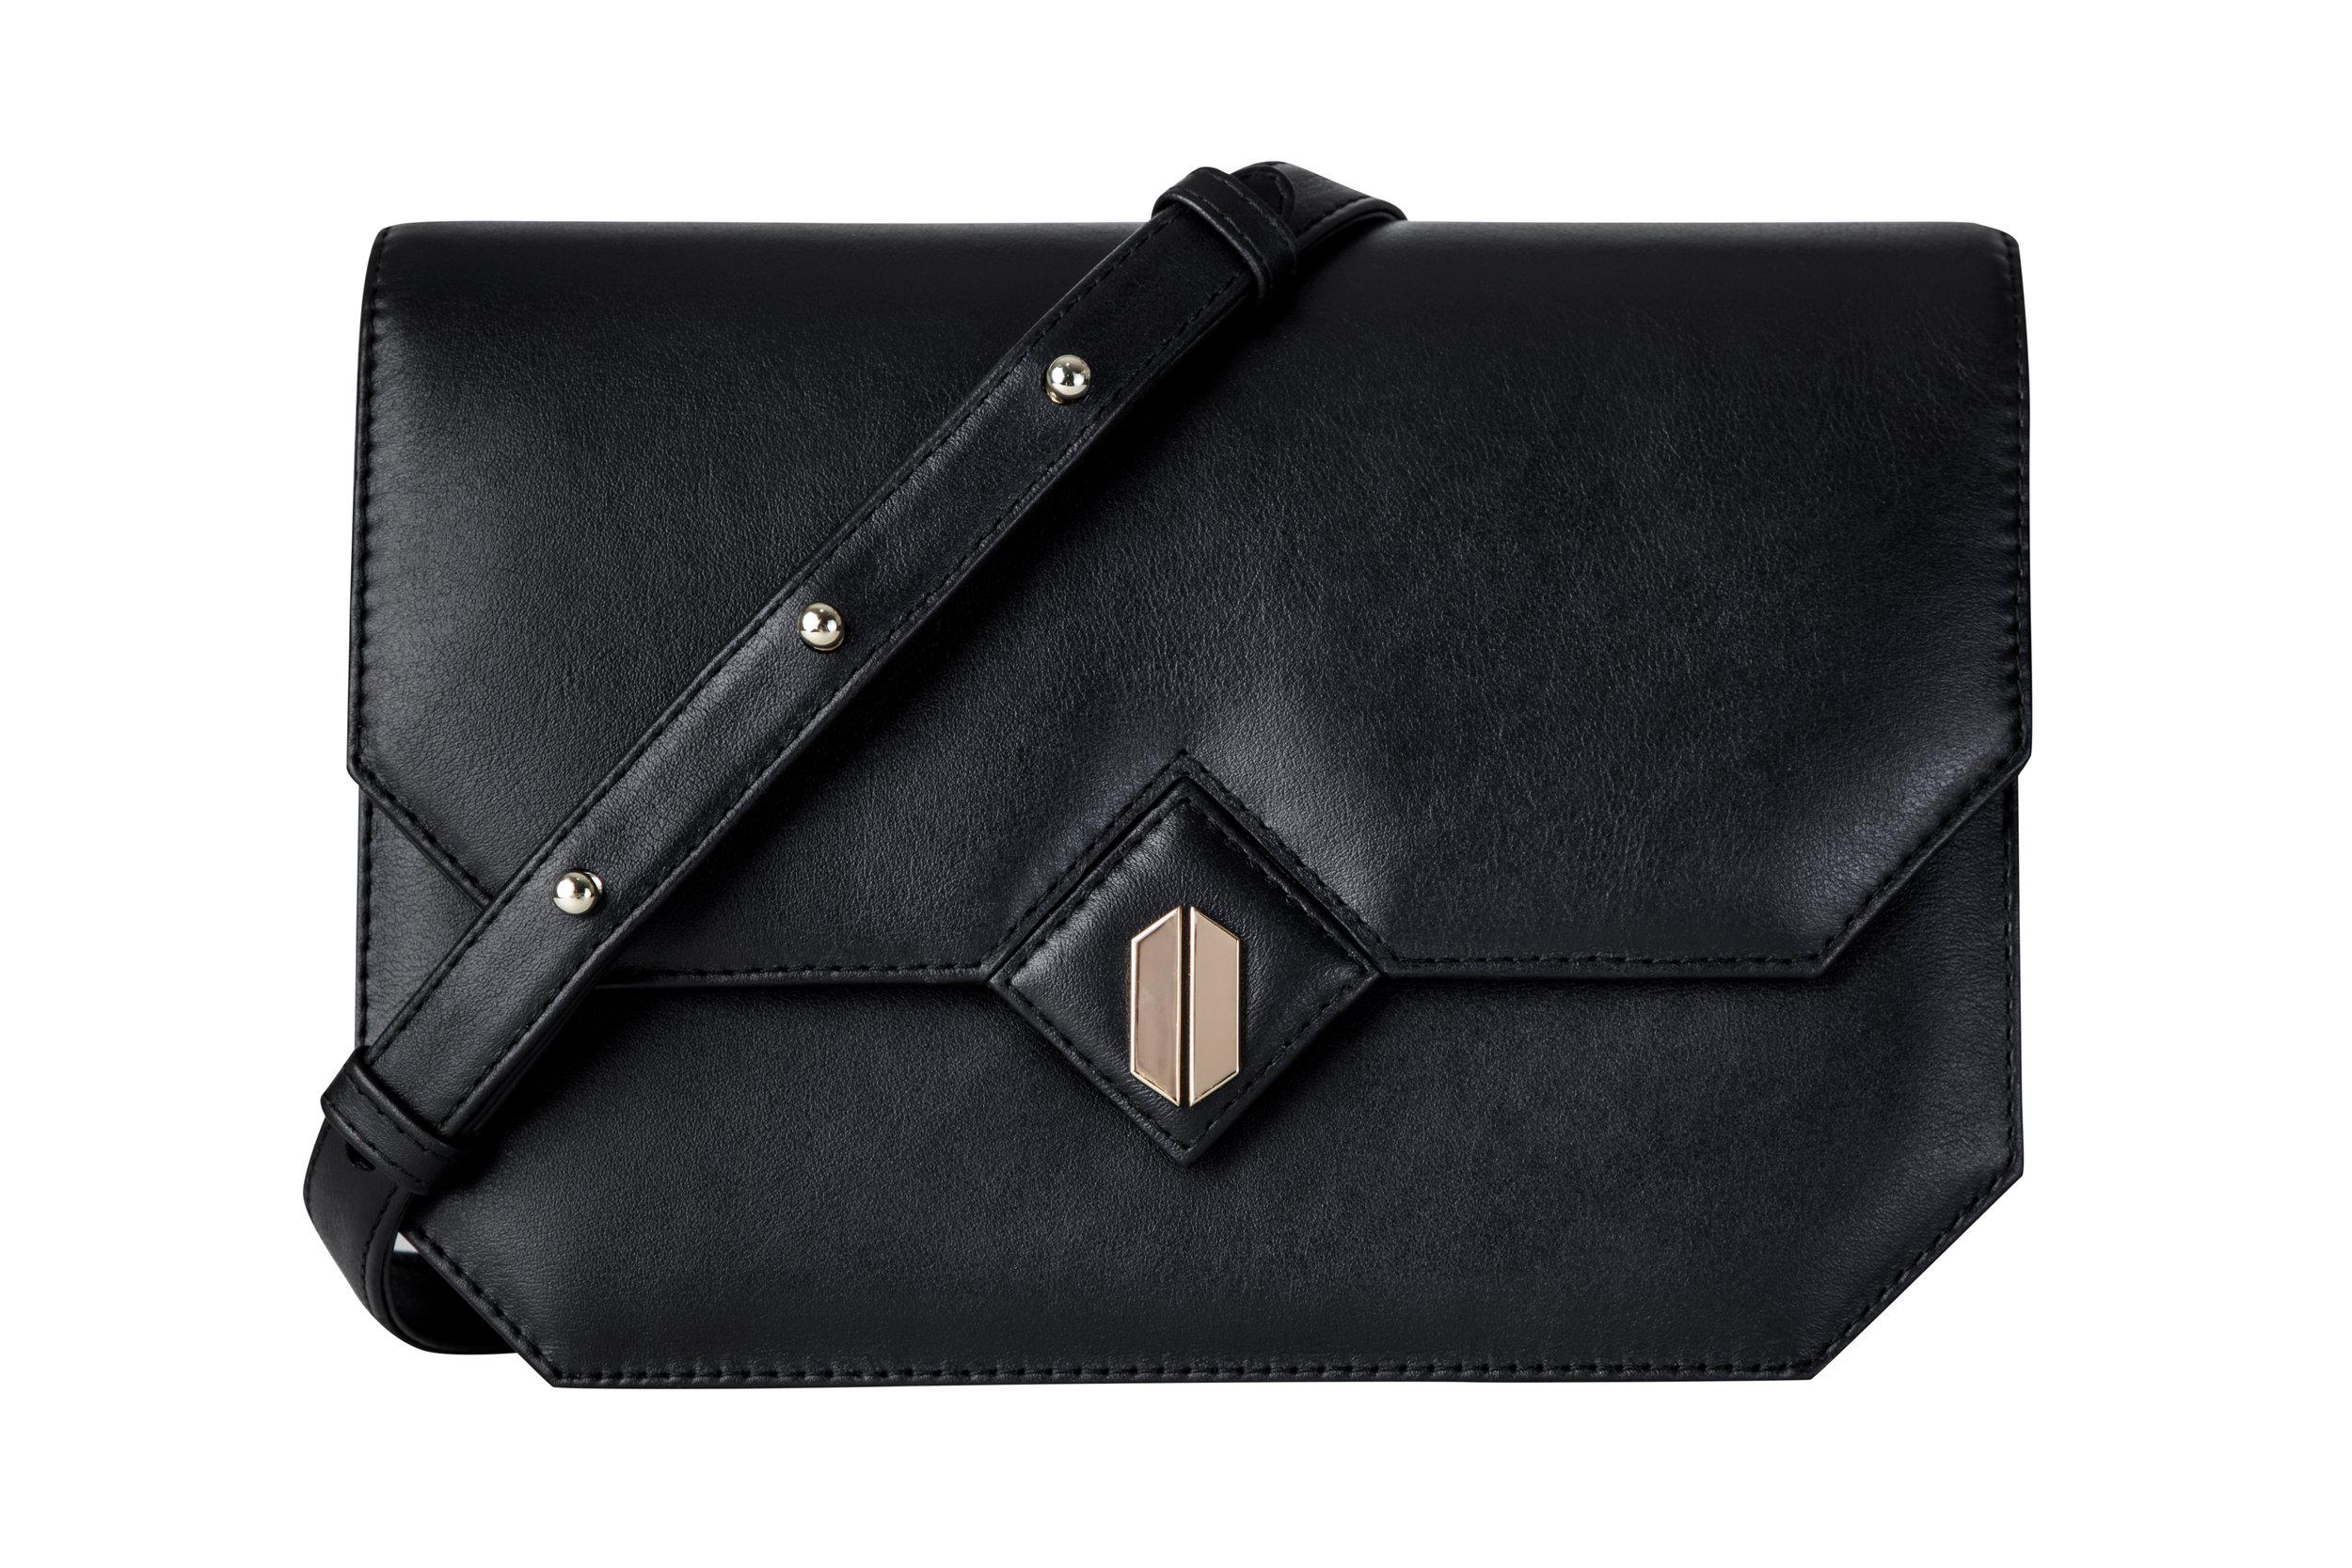 Galatea Bag in Black $445 USD